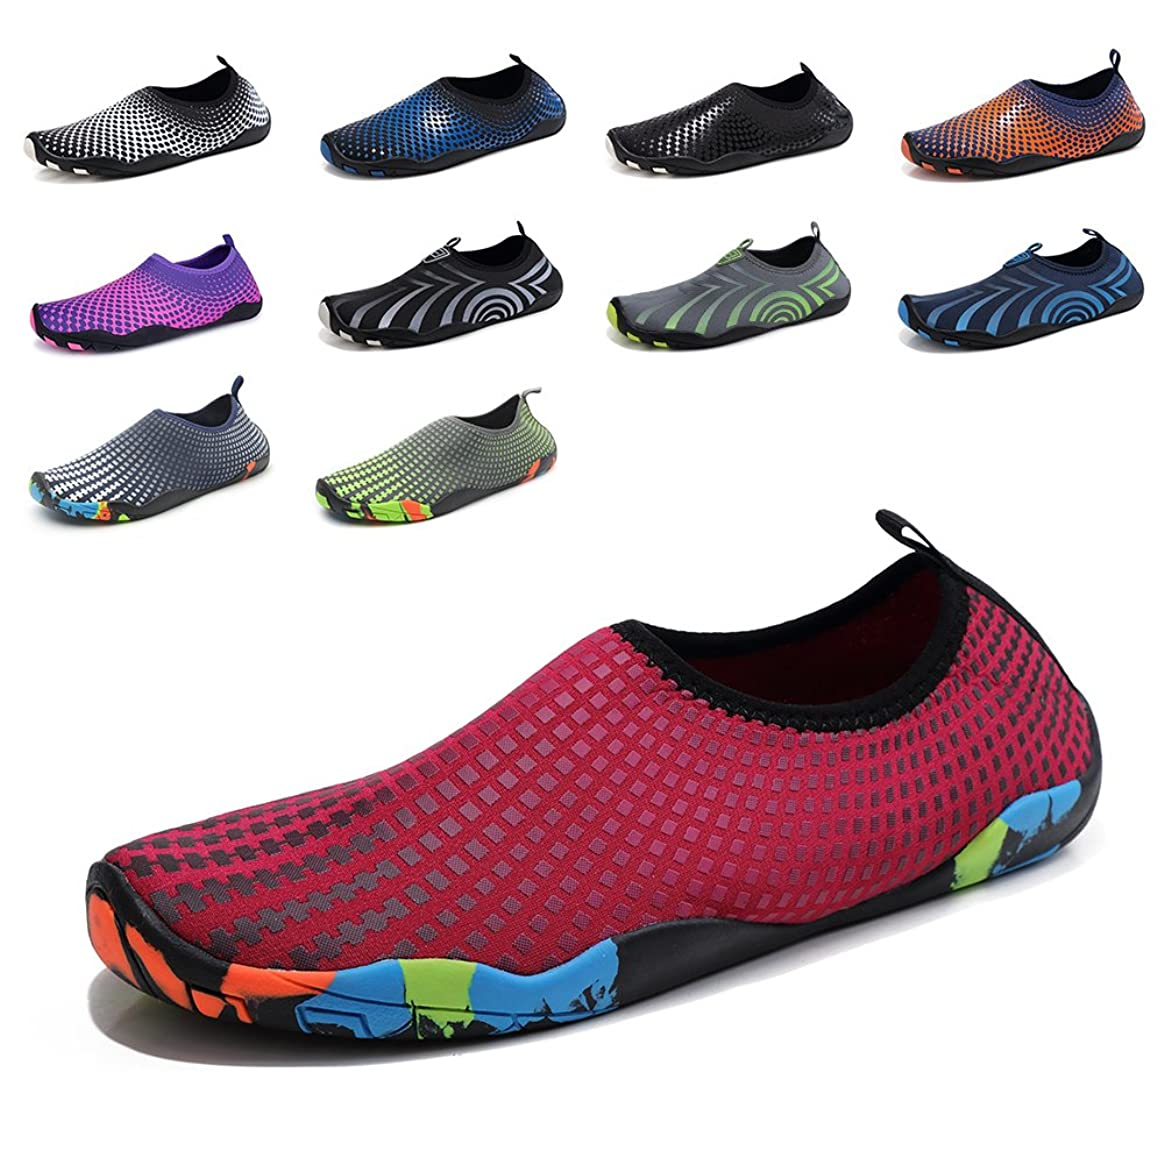 GUBARUN Mens Water Shoes Swim Shoes for Women Quick-Dry Beach Barefoot Surf Yoga Boat Sneakers